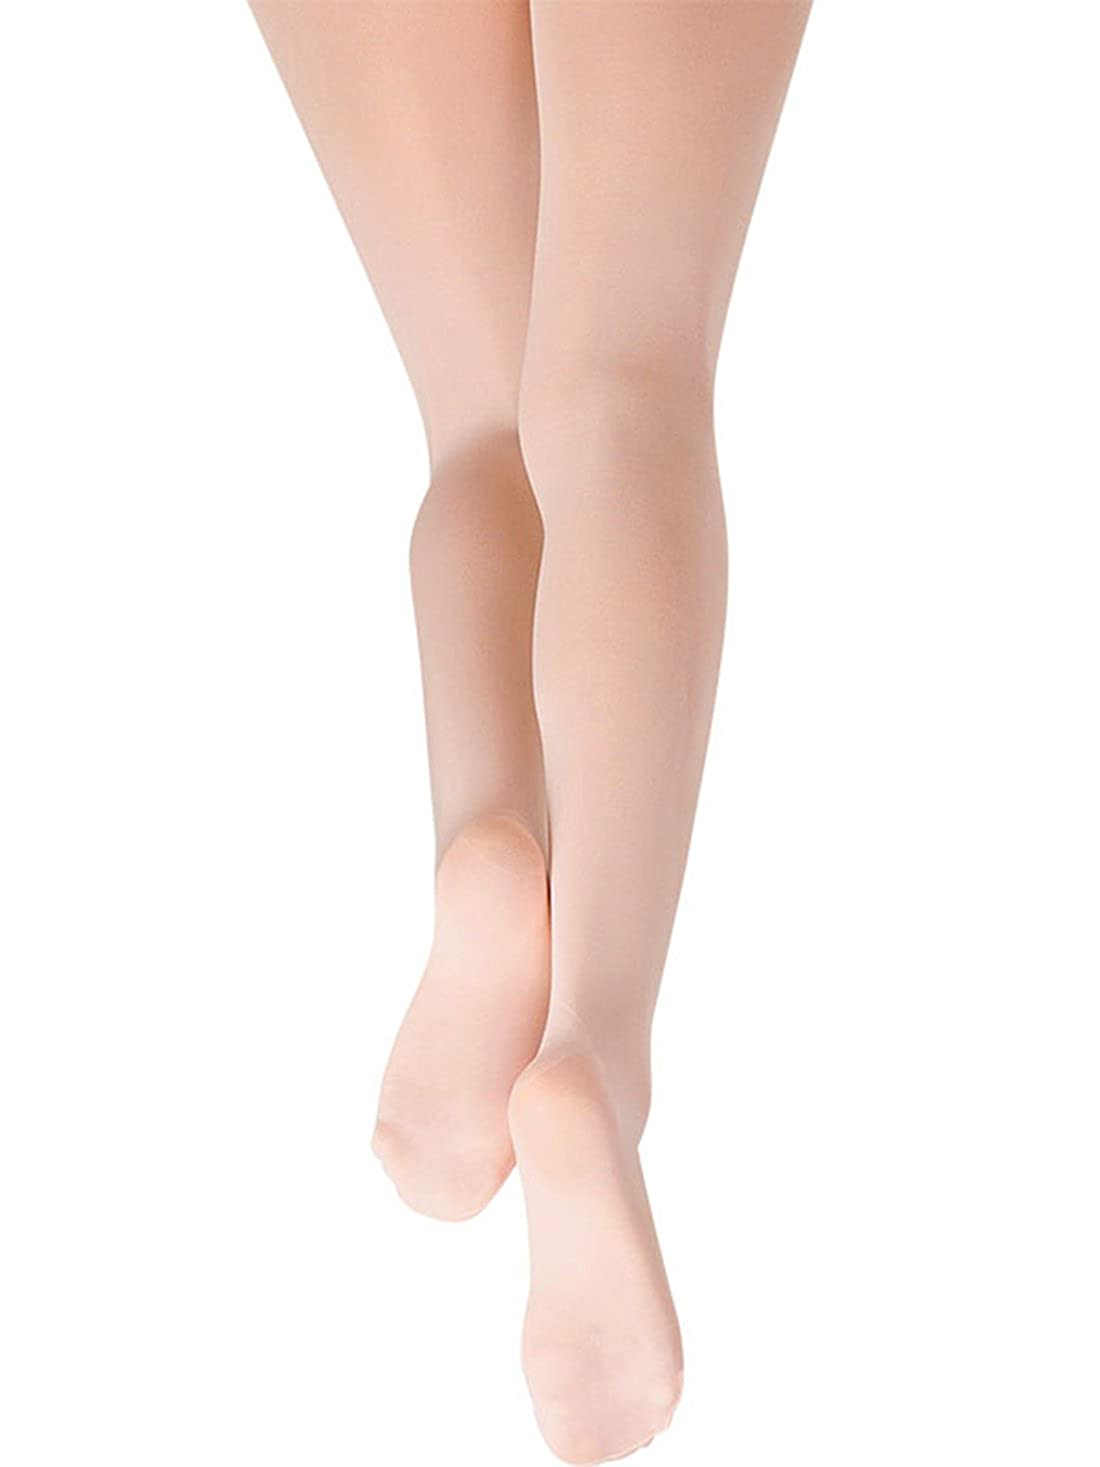 FEOYA Girls Ballet Tights Cotton Stretch Footed Stocking Dance Legging